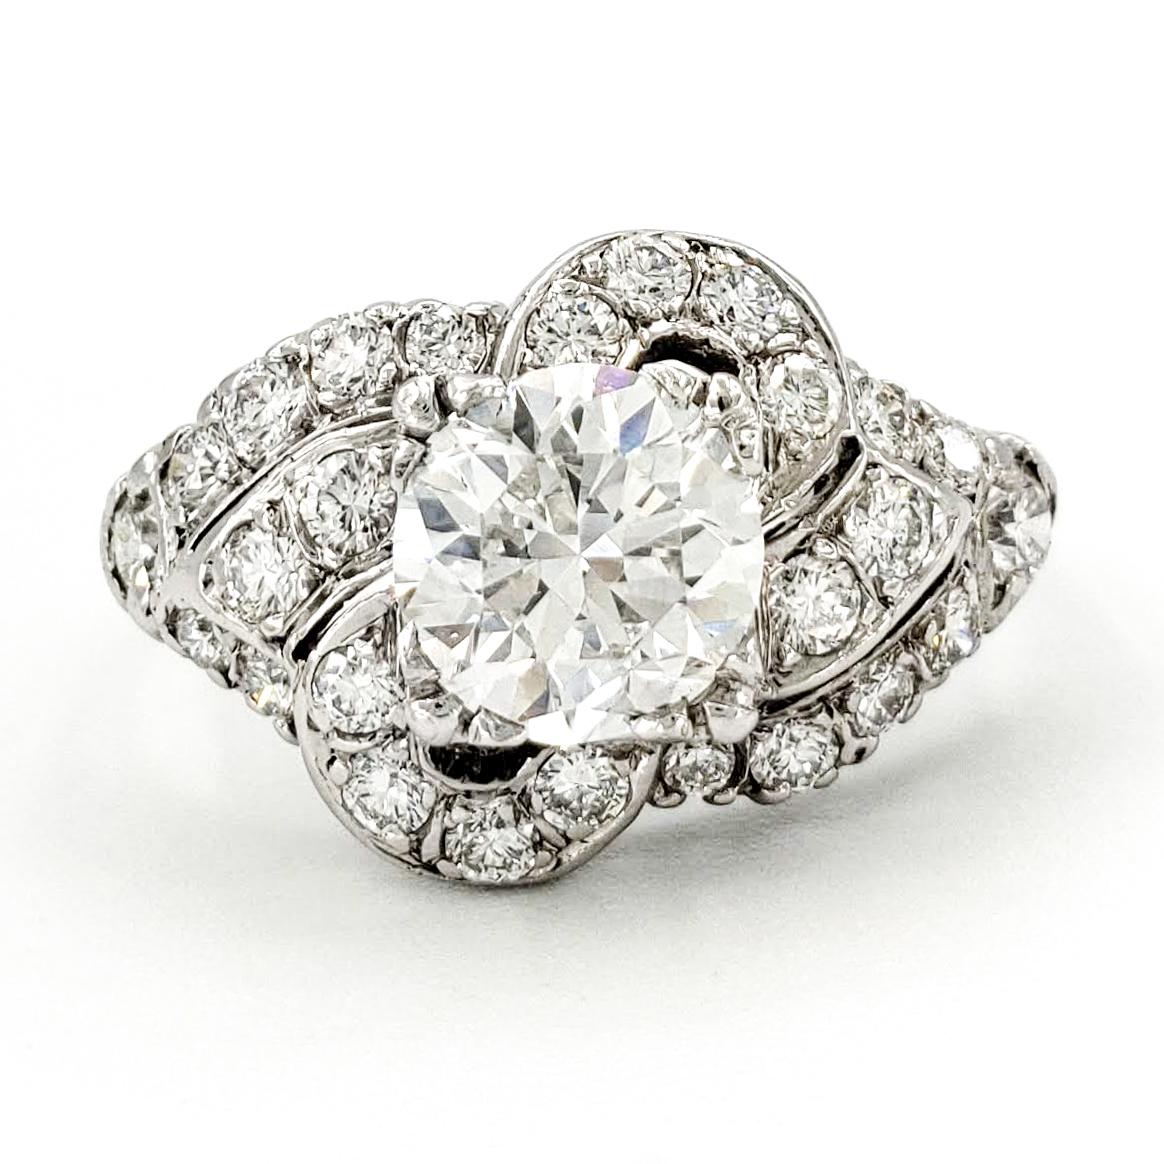 vintage-platinum-engagement-ring-with-1-03-carat-round-brilliant-cut-diamond-egl-g-vs1